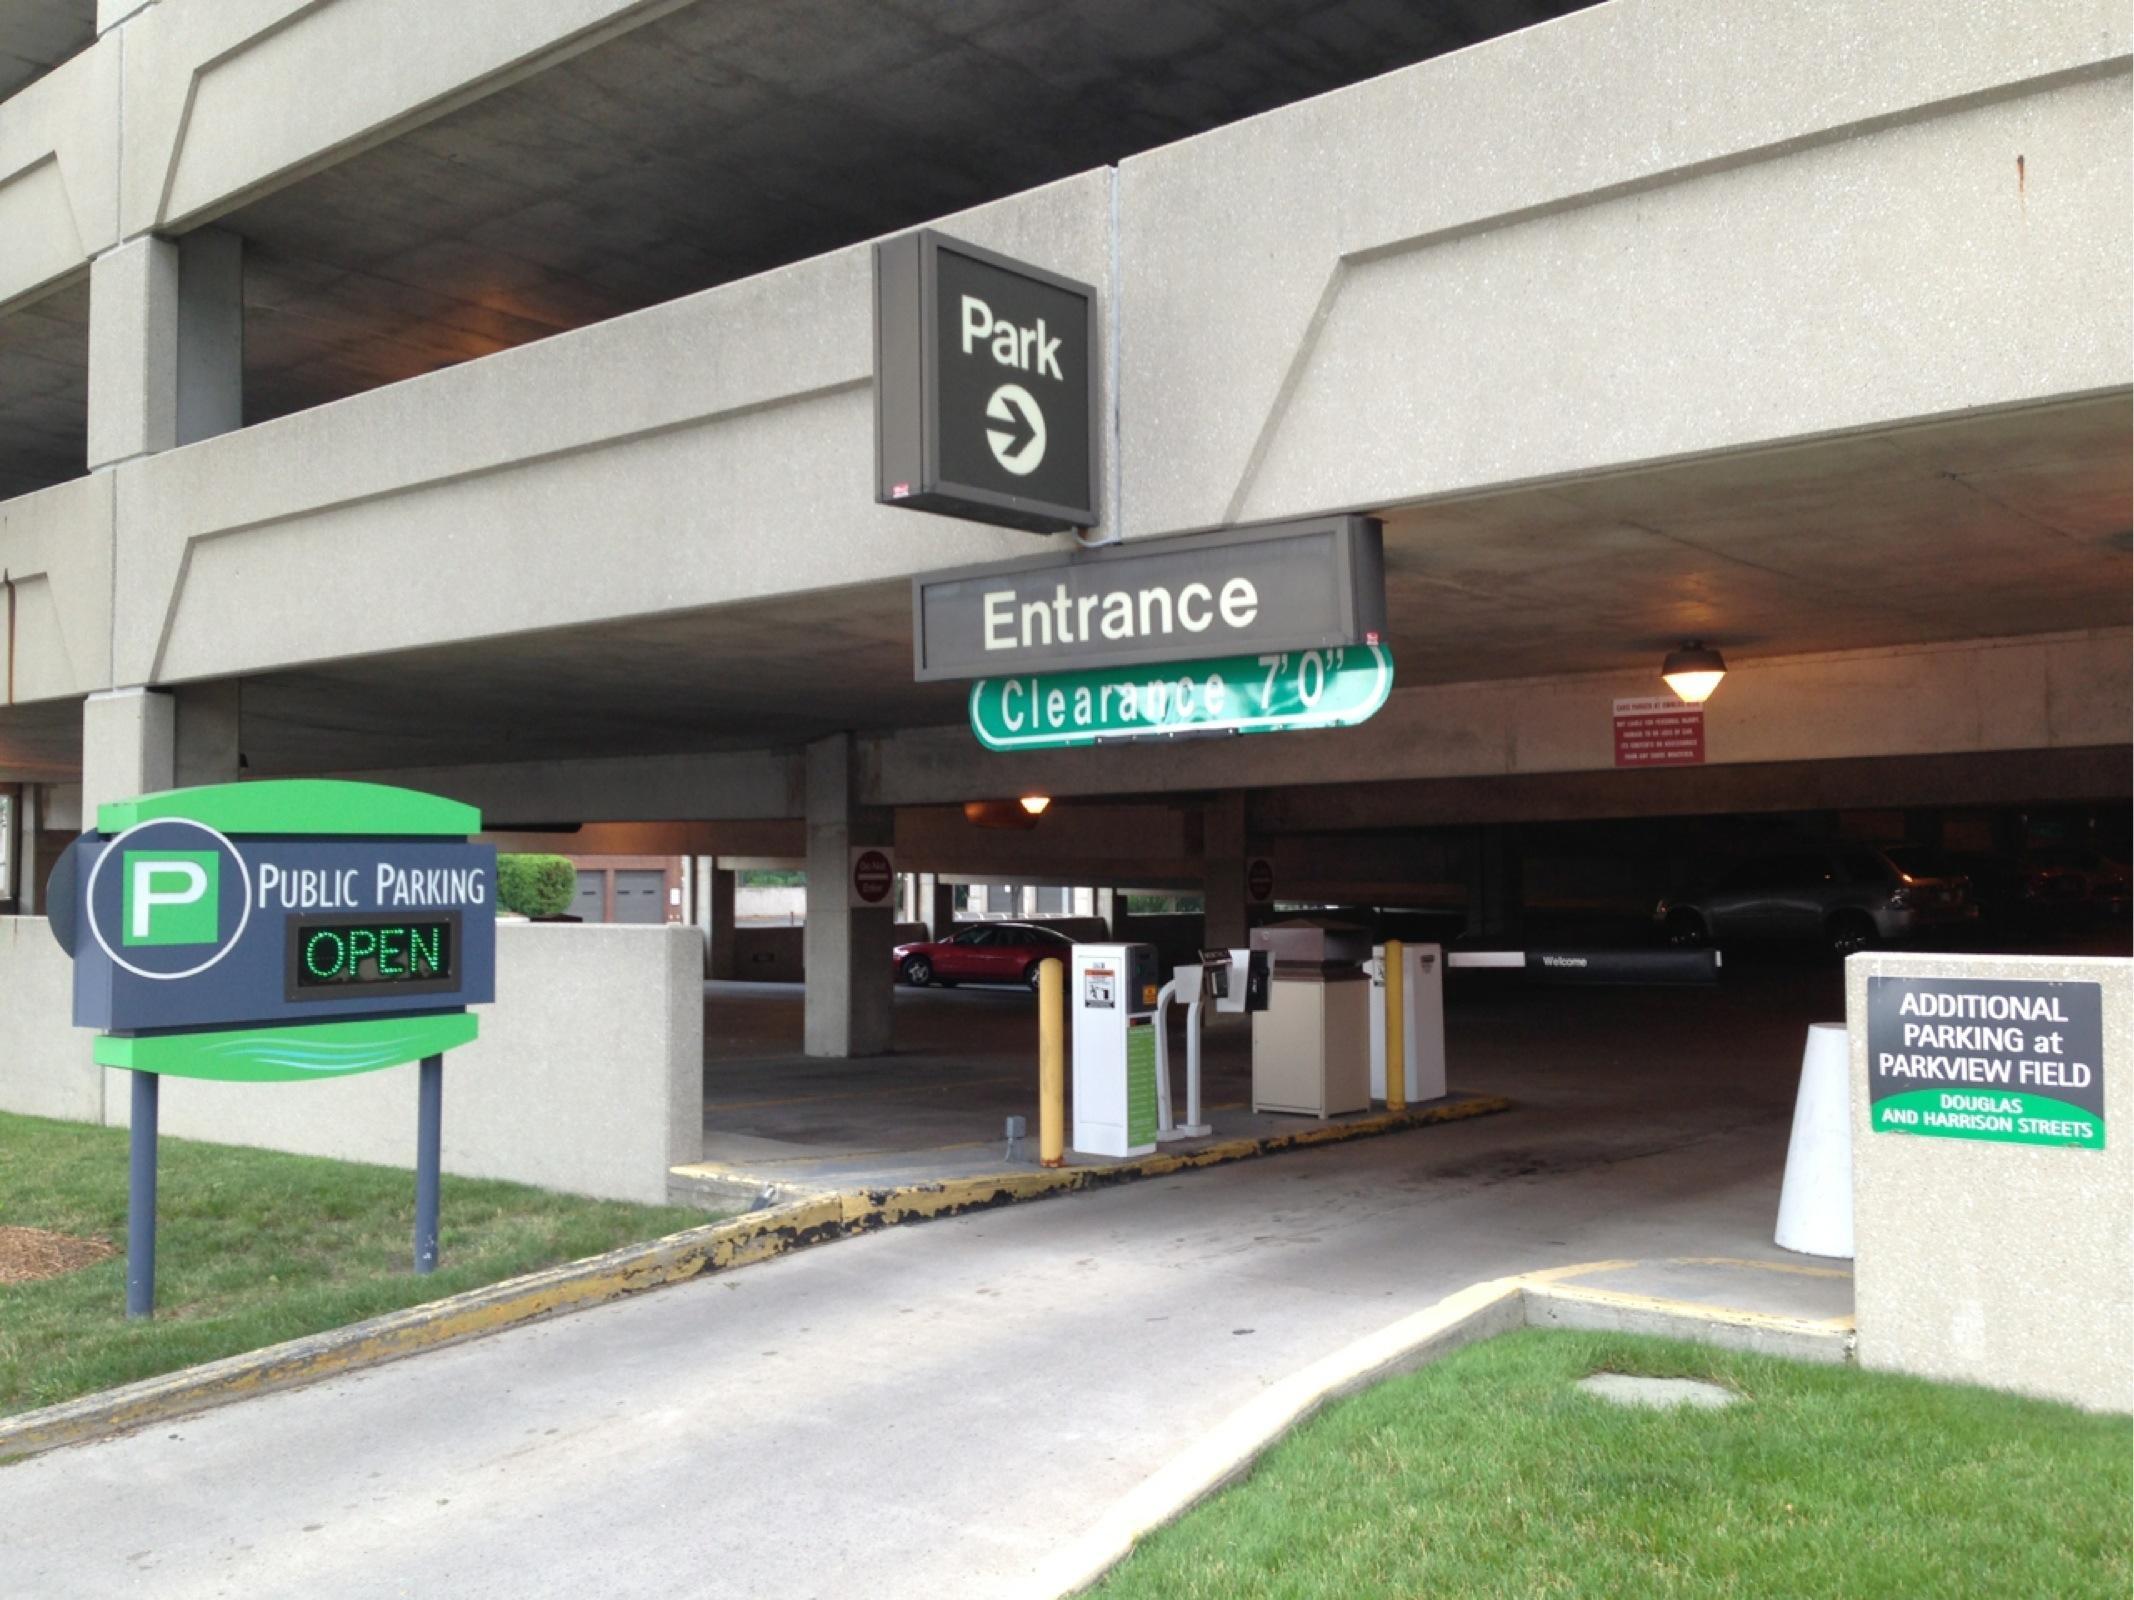 Civic Center Garage: Civic Center Parking Garage - Parking In Fort Wayne